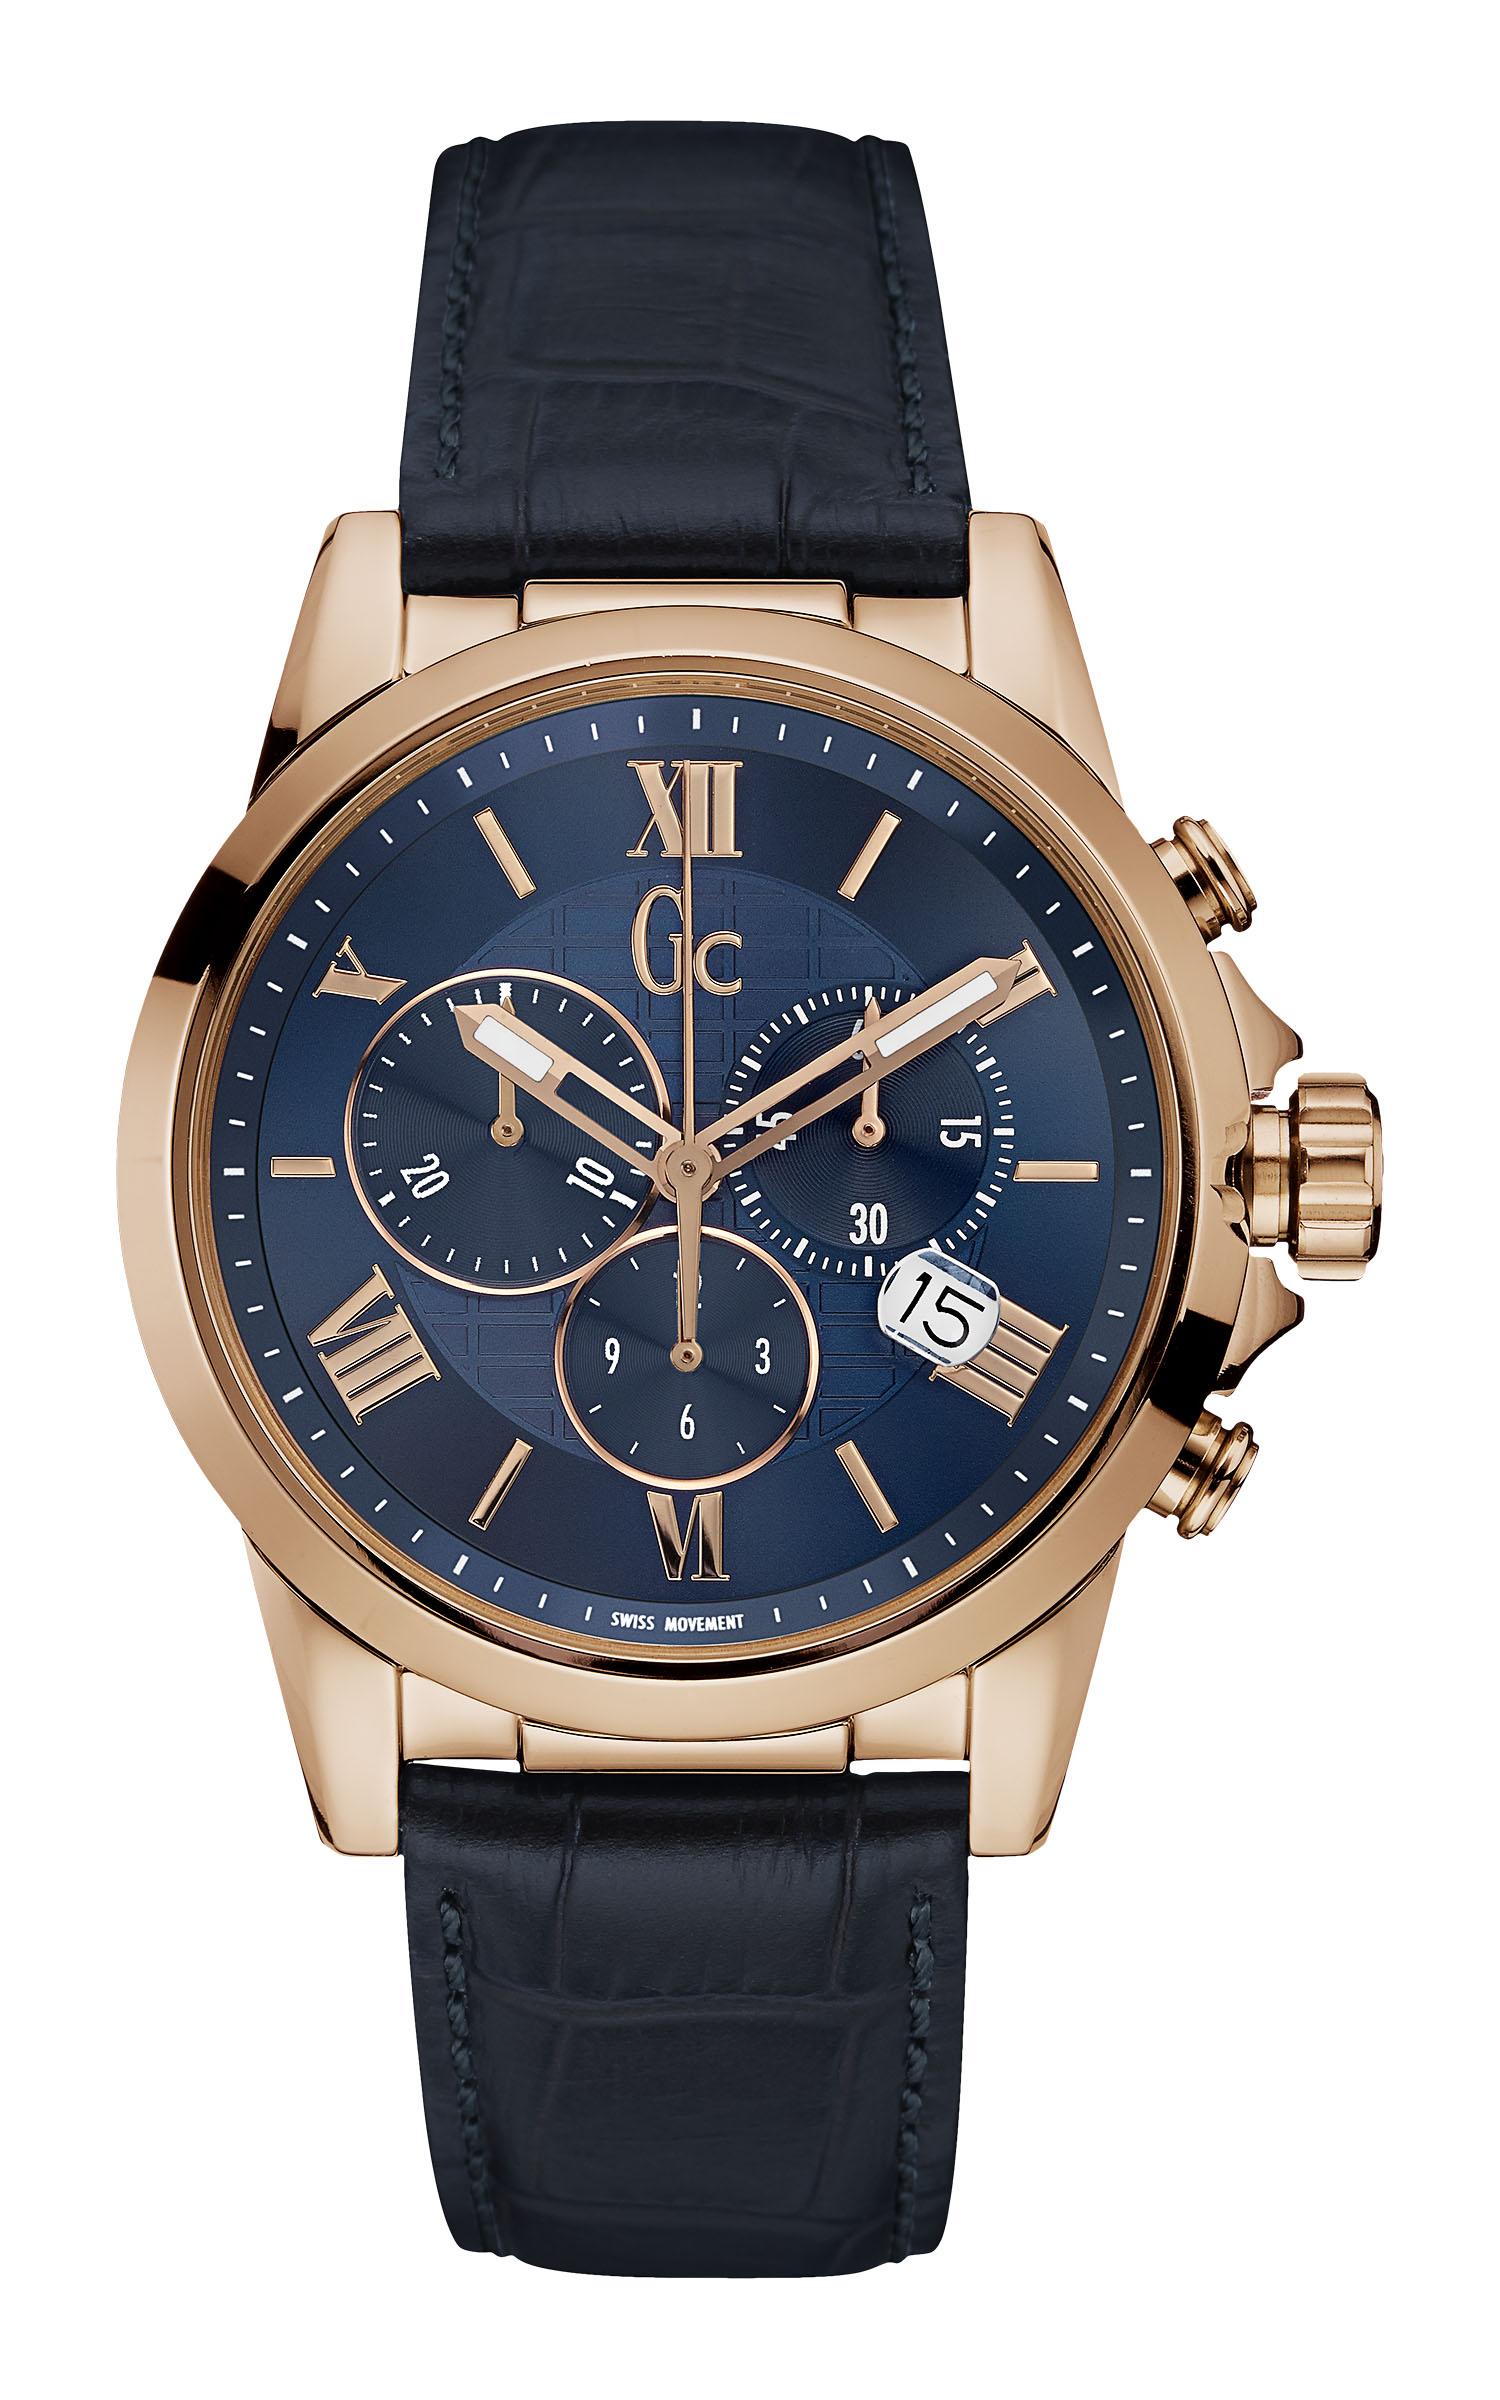 Reloj GC Smart Luxury Swiss Movement